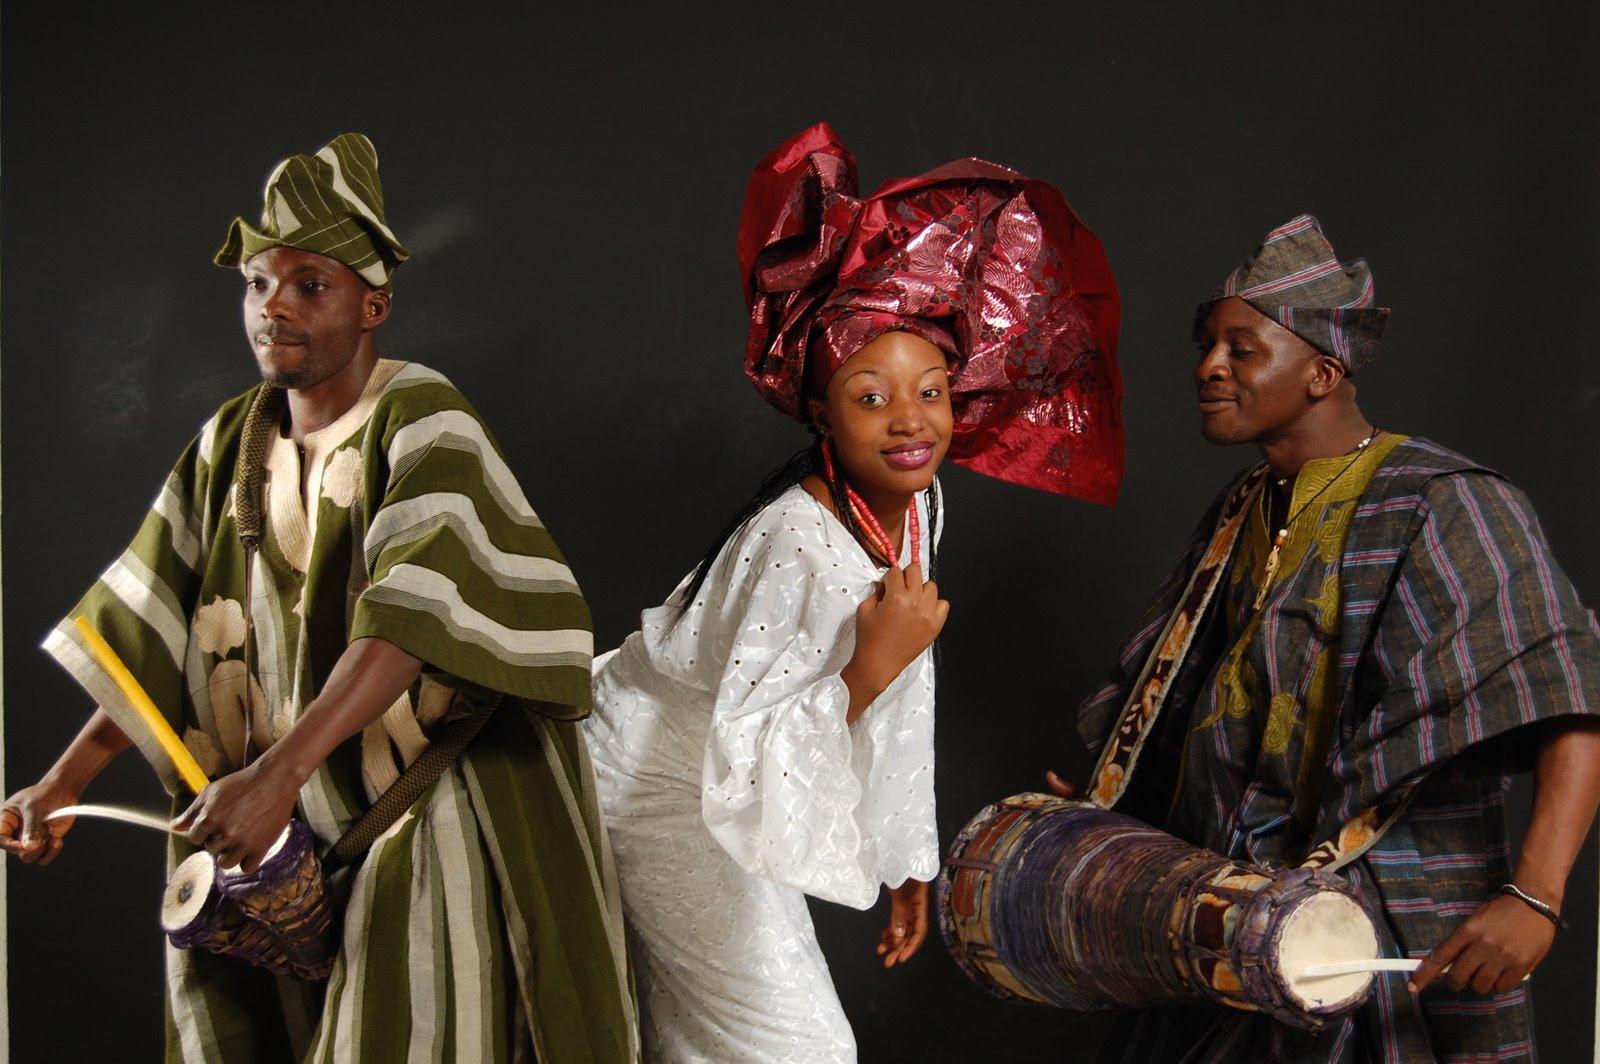 EKITI PEOPLE: CULTURALLY HOMOGENEOUS AND HILLY INTELLECTUAL YORUBA